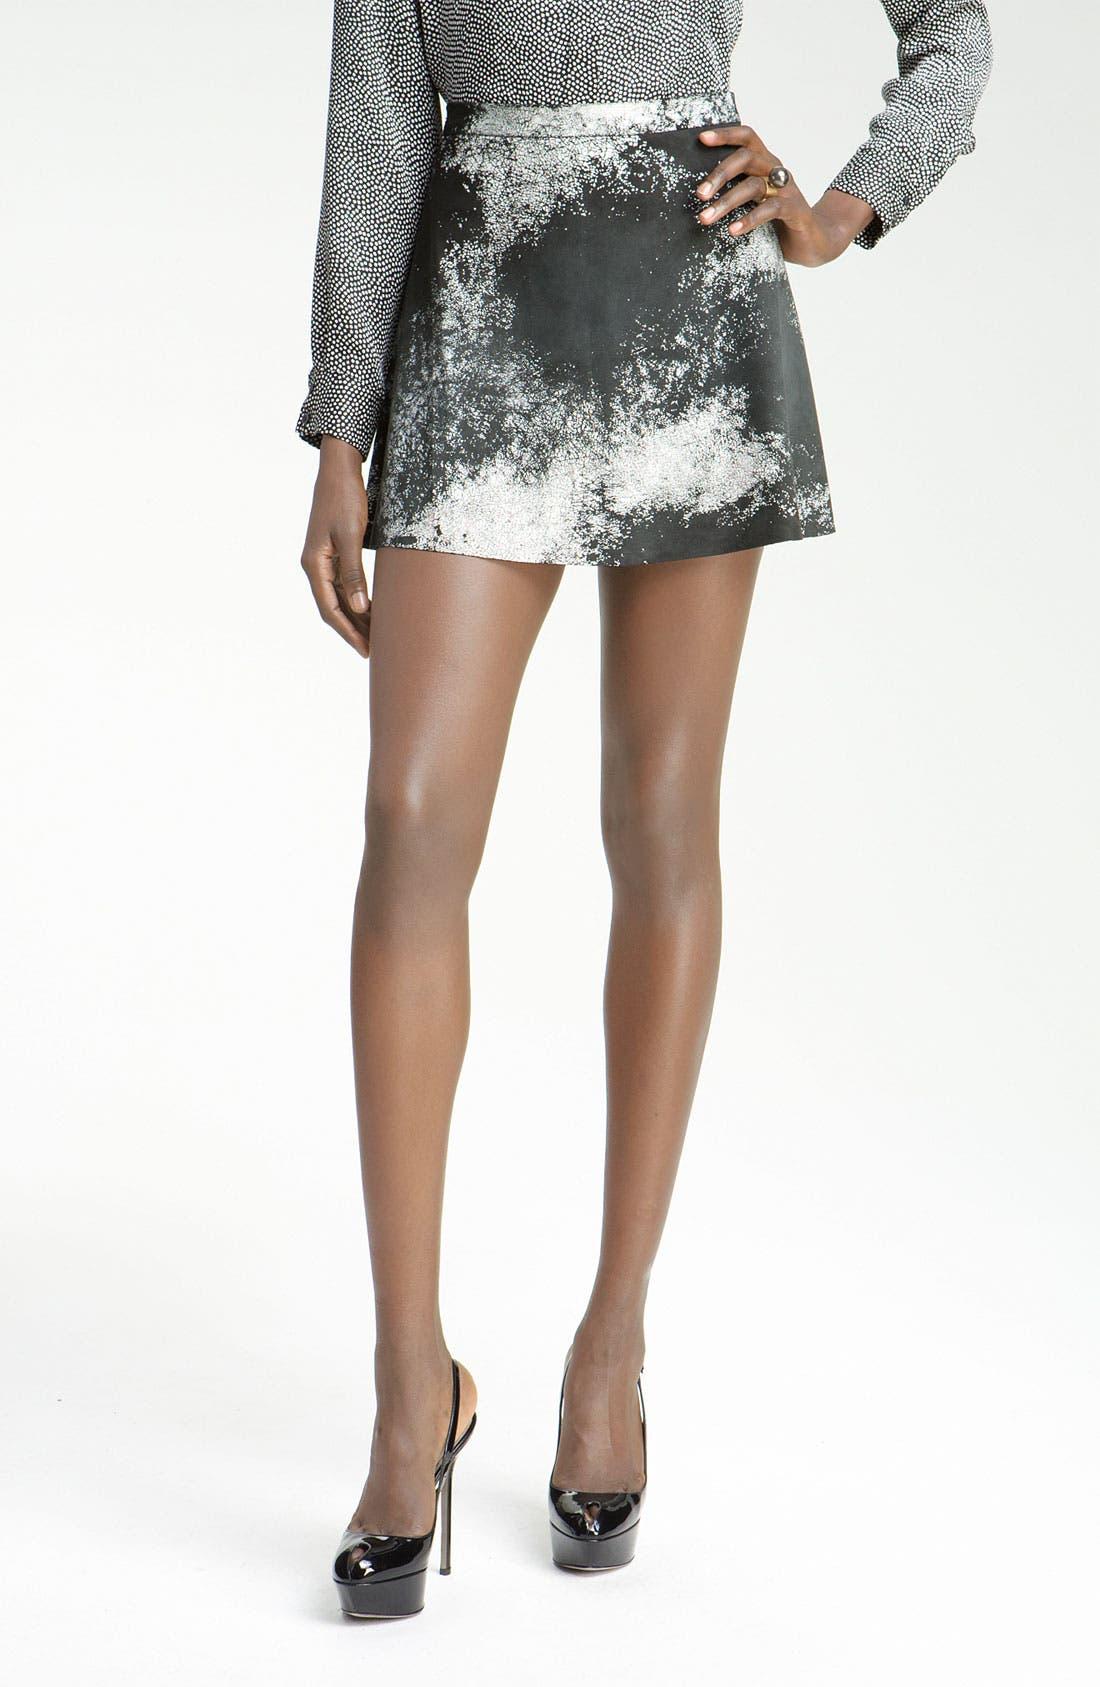 Main Image - Kelly Wearstler 'Swagger' Print Leather Skirt